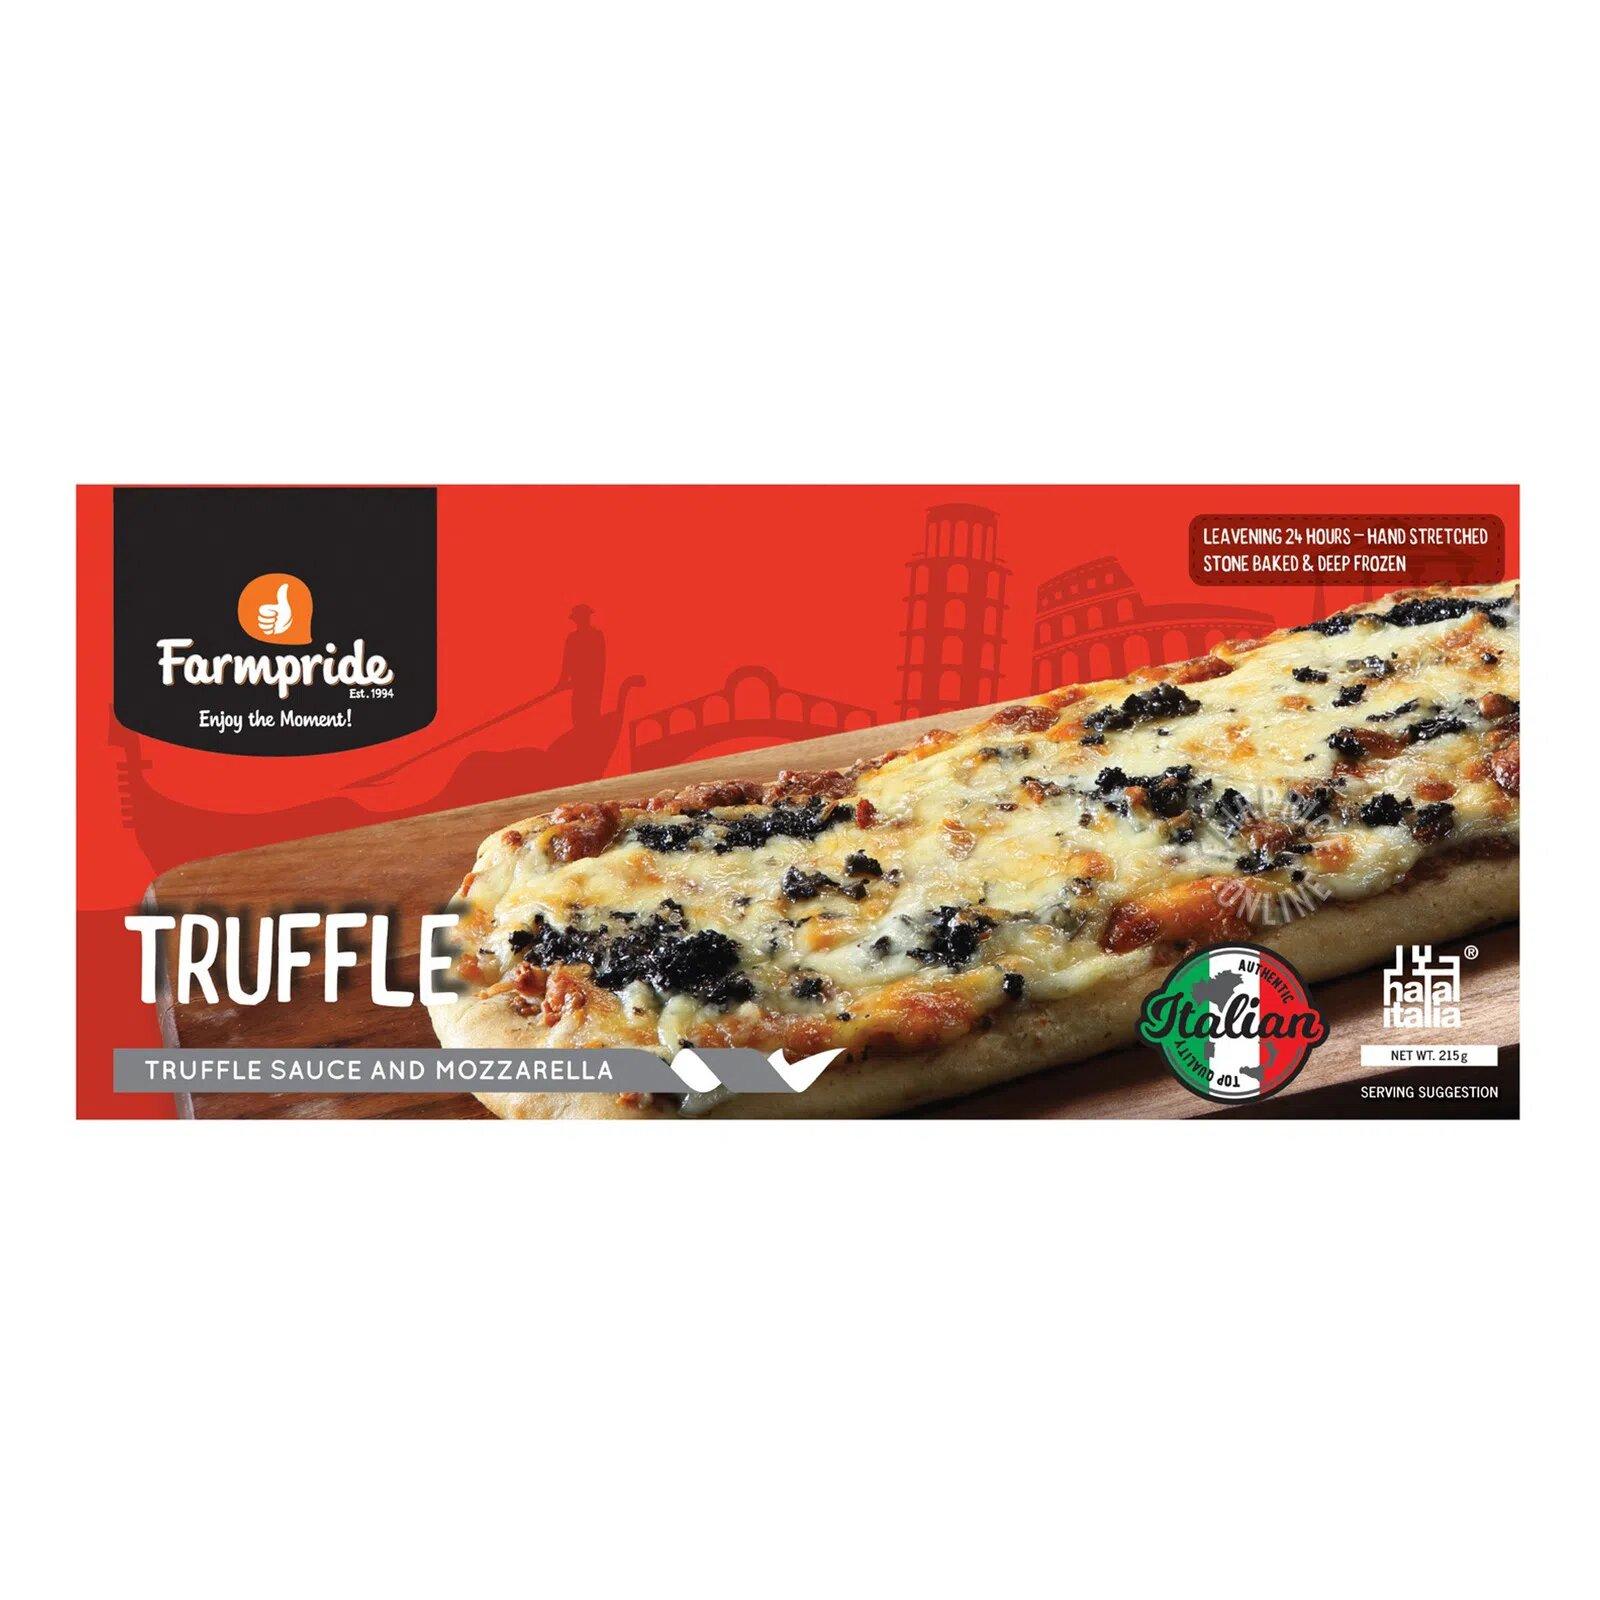 Farmpride Stone Baked & Frozen Pizza - Truffle